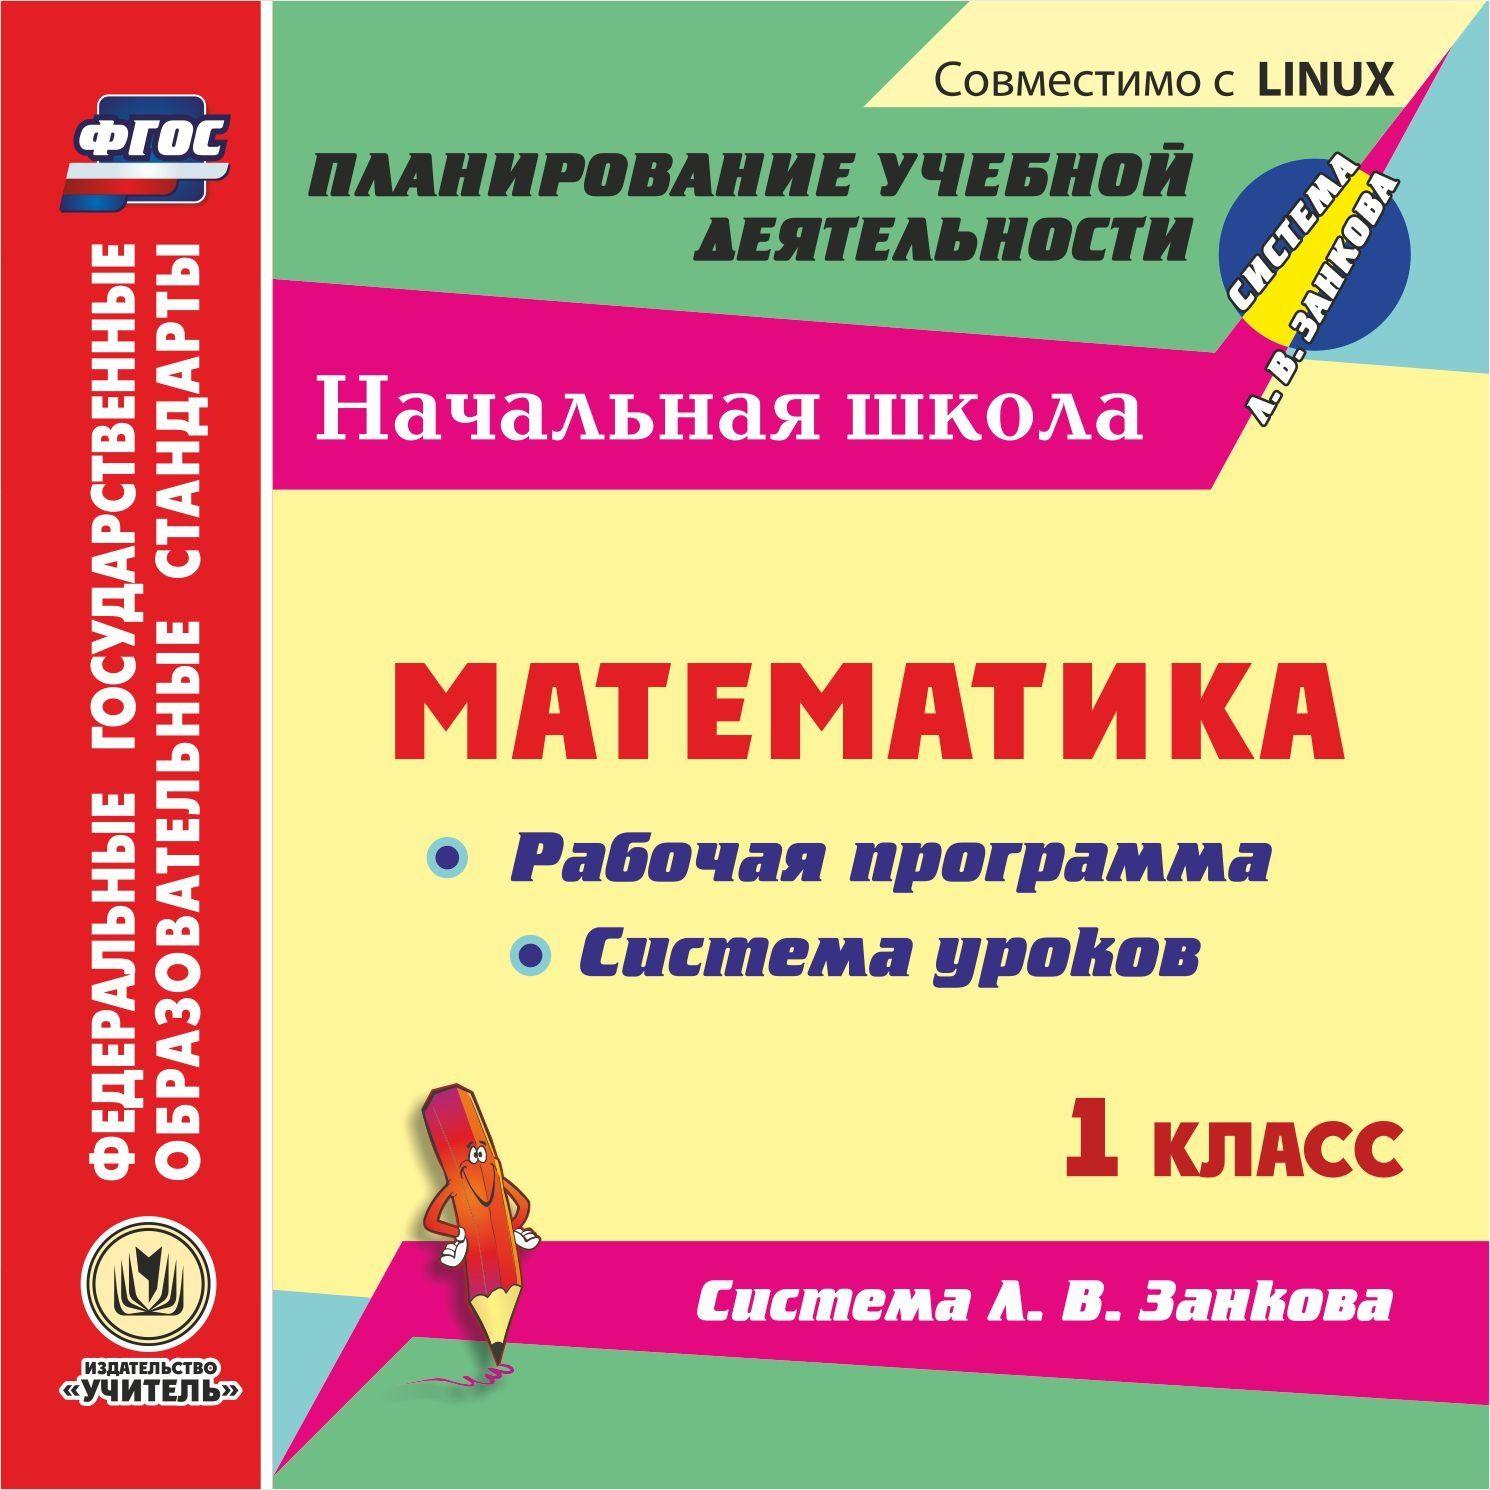 Математика. 1 класс. Рабочая программа и система уроков по системе Л. В. Занкова. Компакт-диск для компьютера